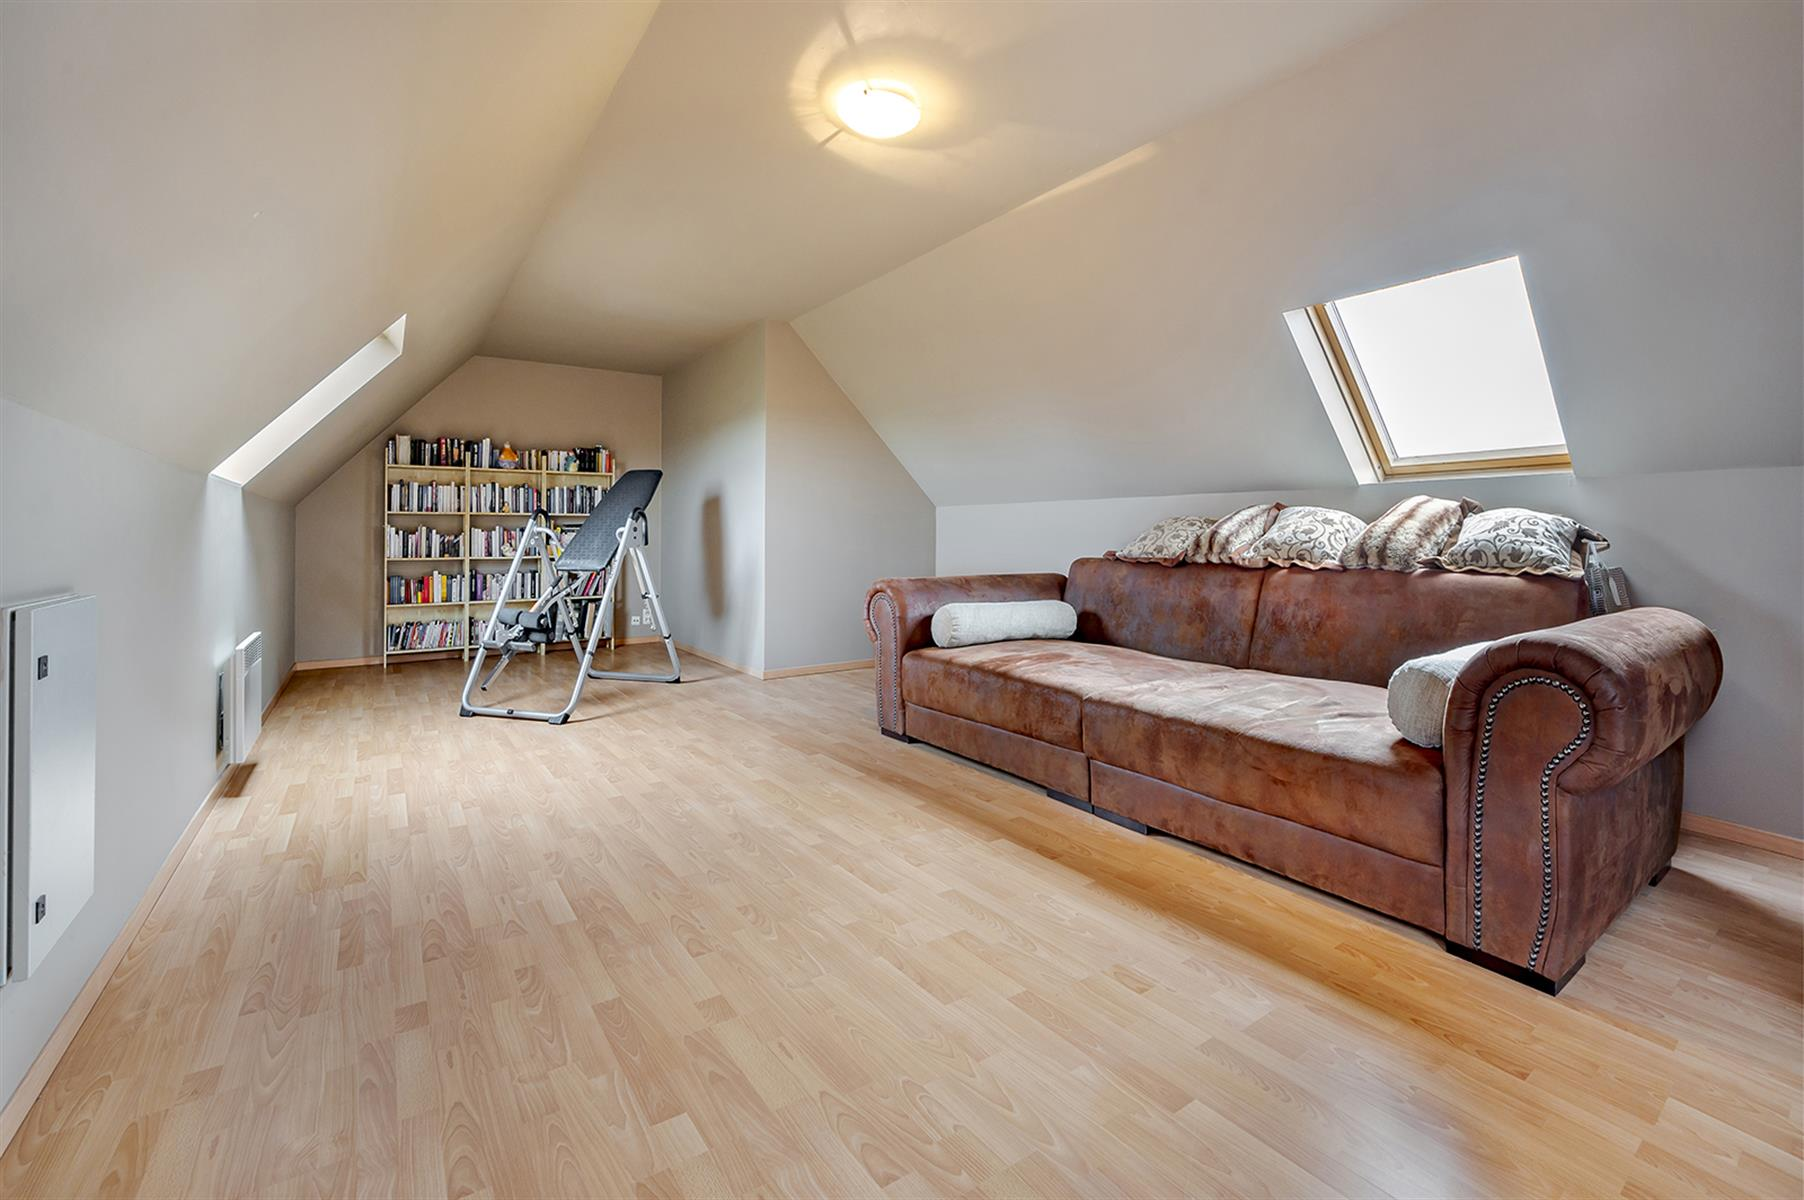 Maison - Orp-Jauche - #4014627-20